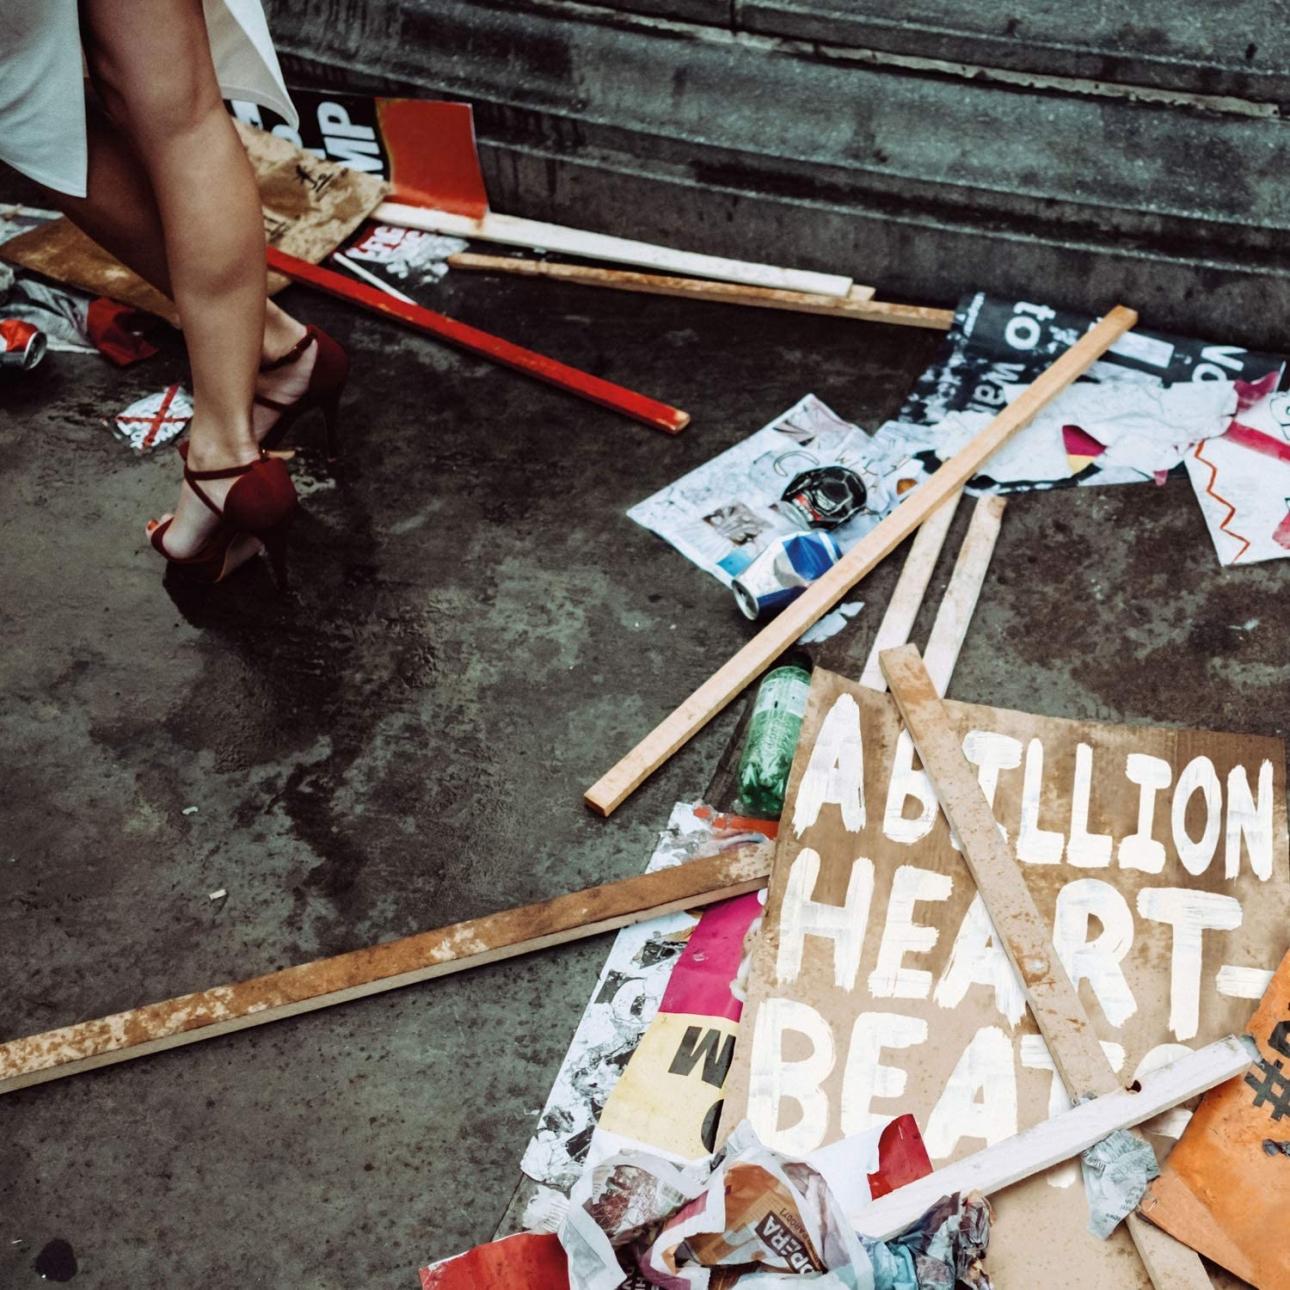 Mystery Jets - A Billion Heartbeats | Album Review